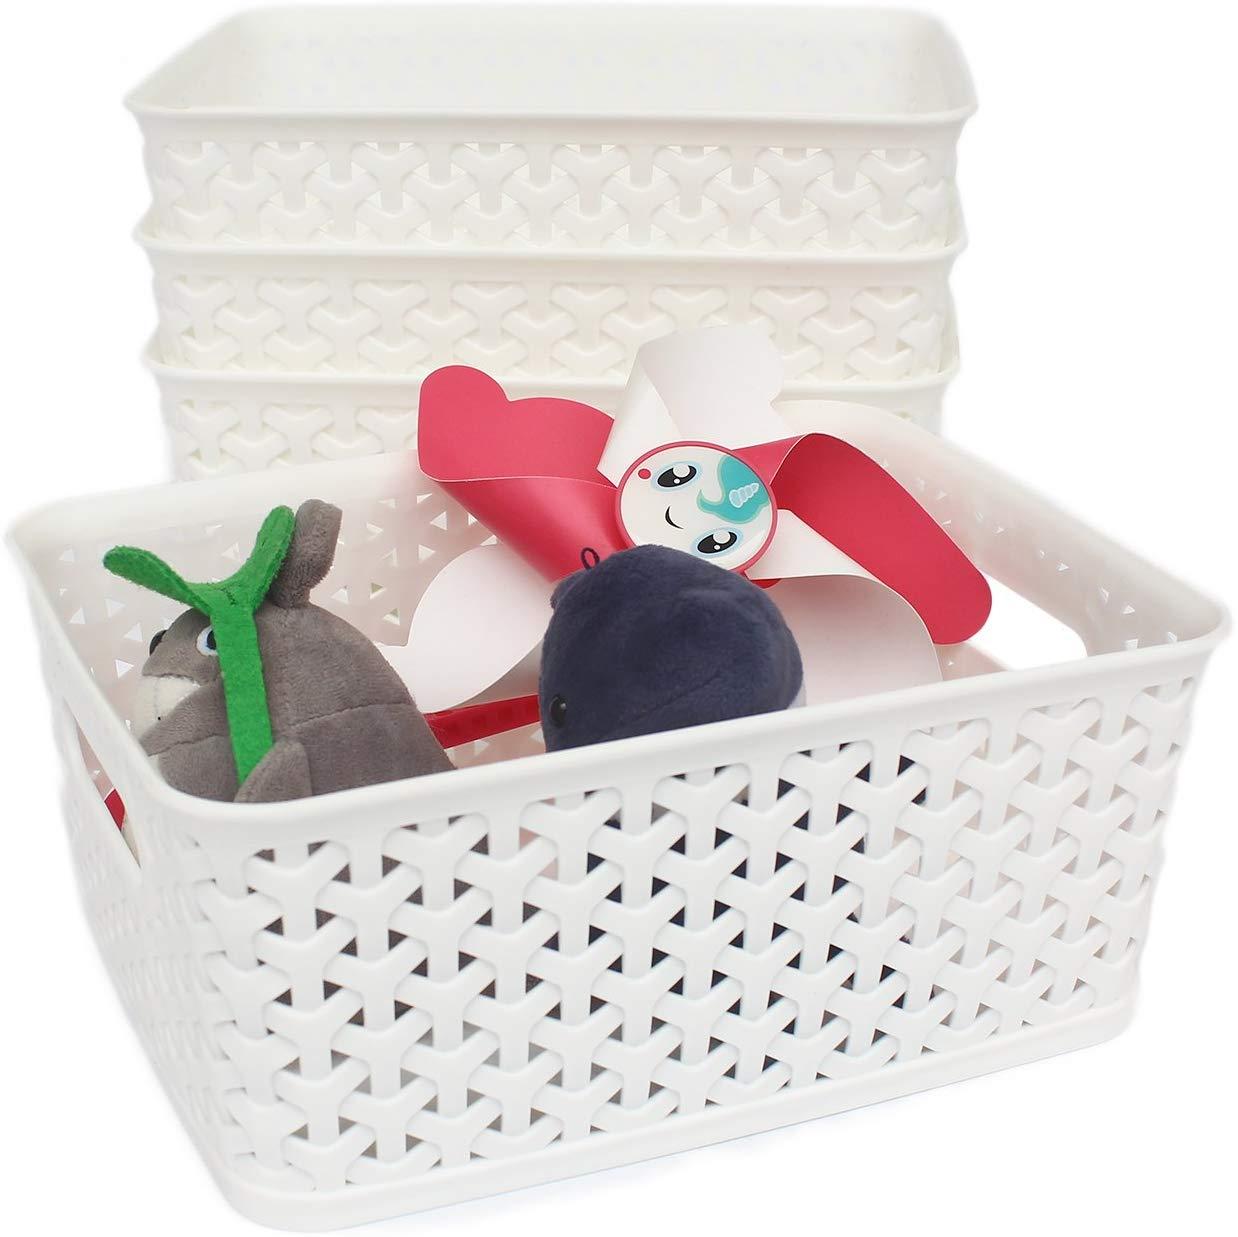 Plastic Storage Baskets & Bins